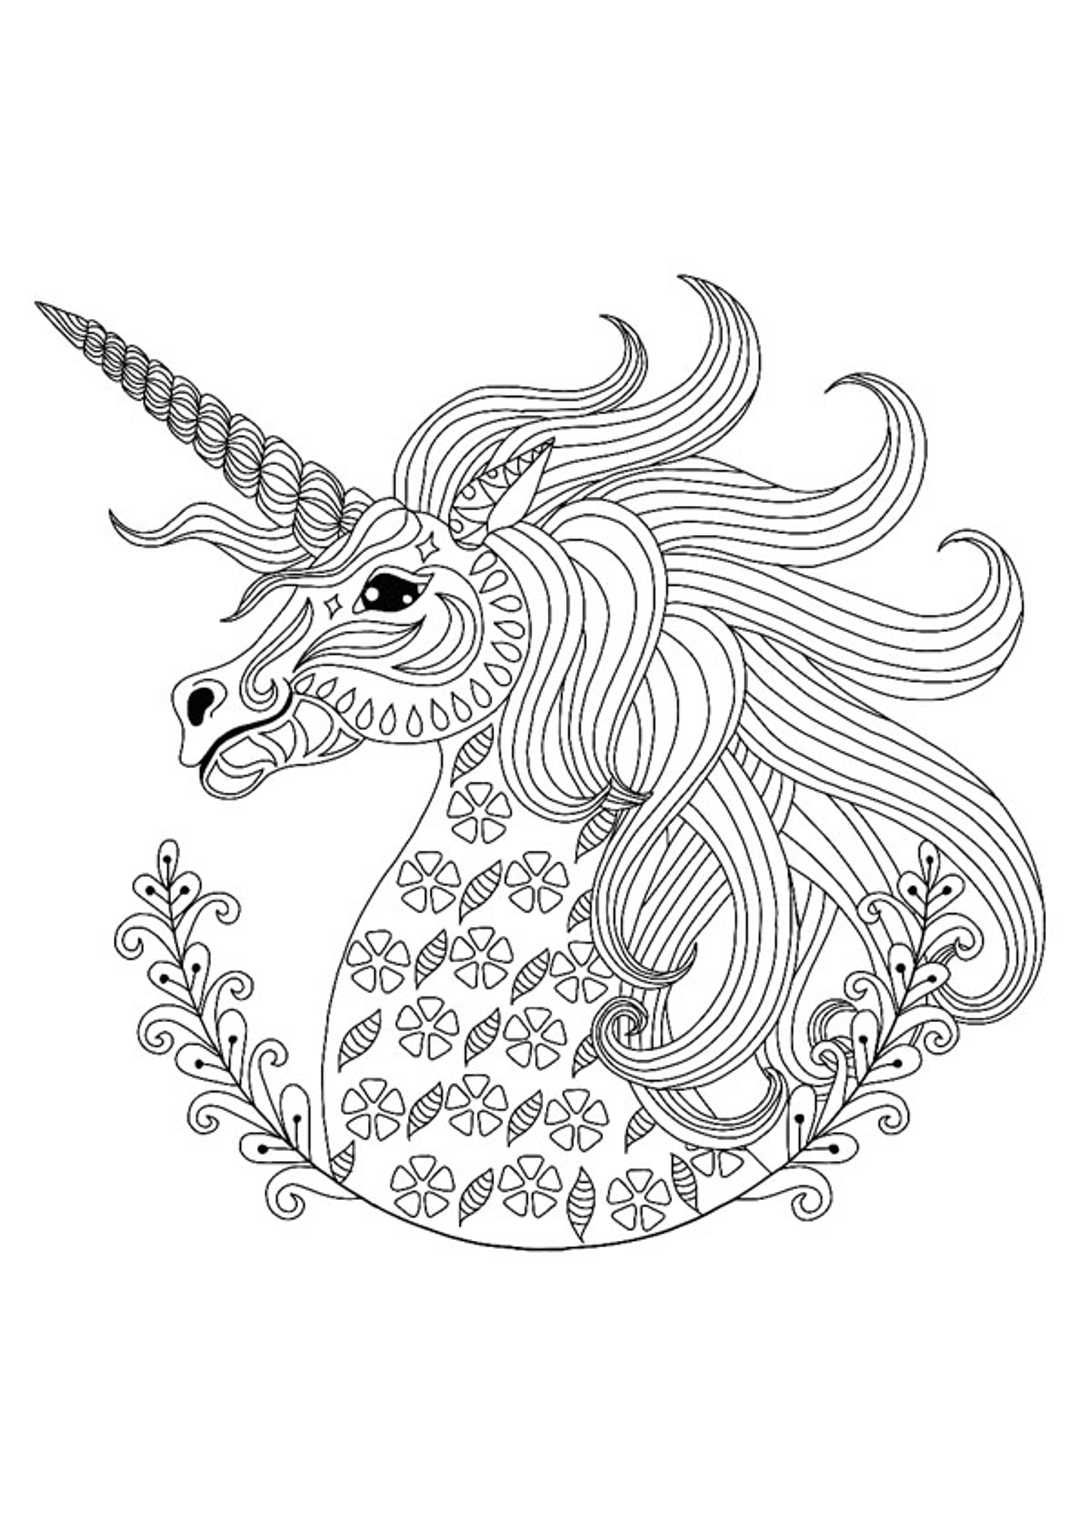 Unicorn Mandala Coloring Pages Unicorn Coloring Pages Mandala Coloring Pages Mandala Coloring